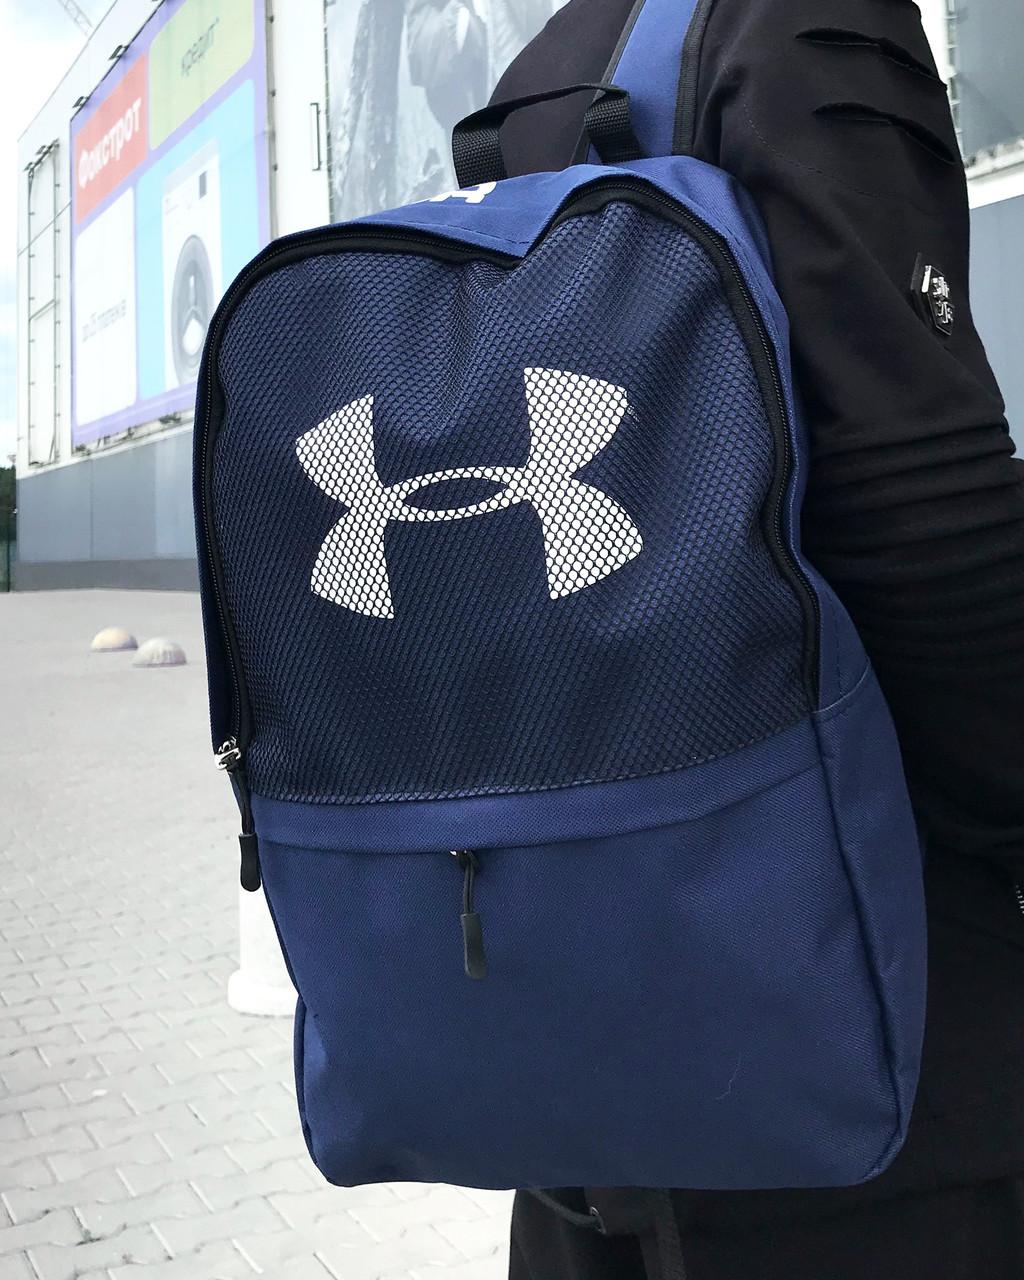 Мужской рюкзак в стиле Under Armour темно-синий